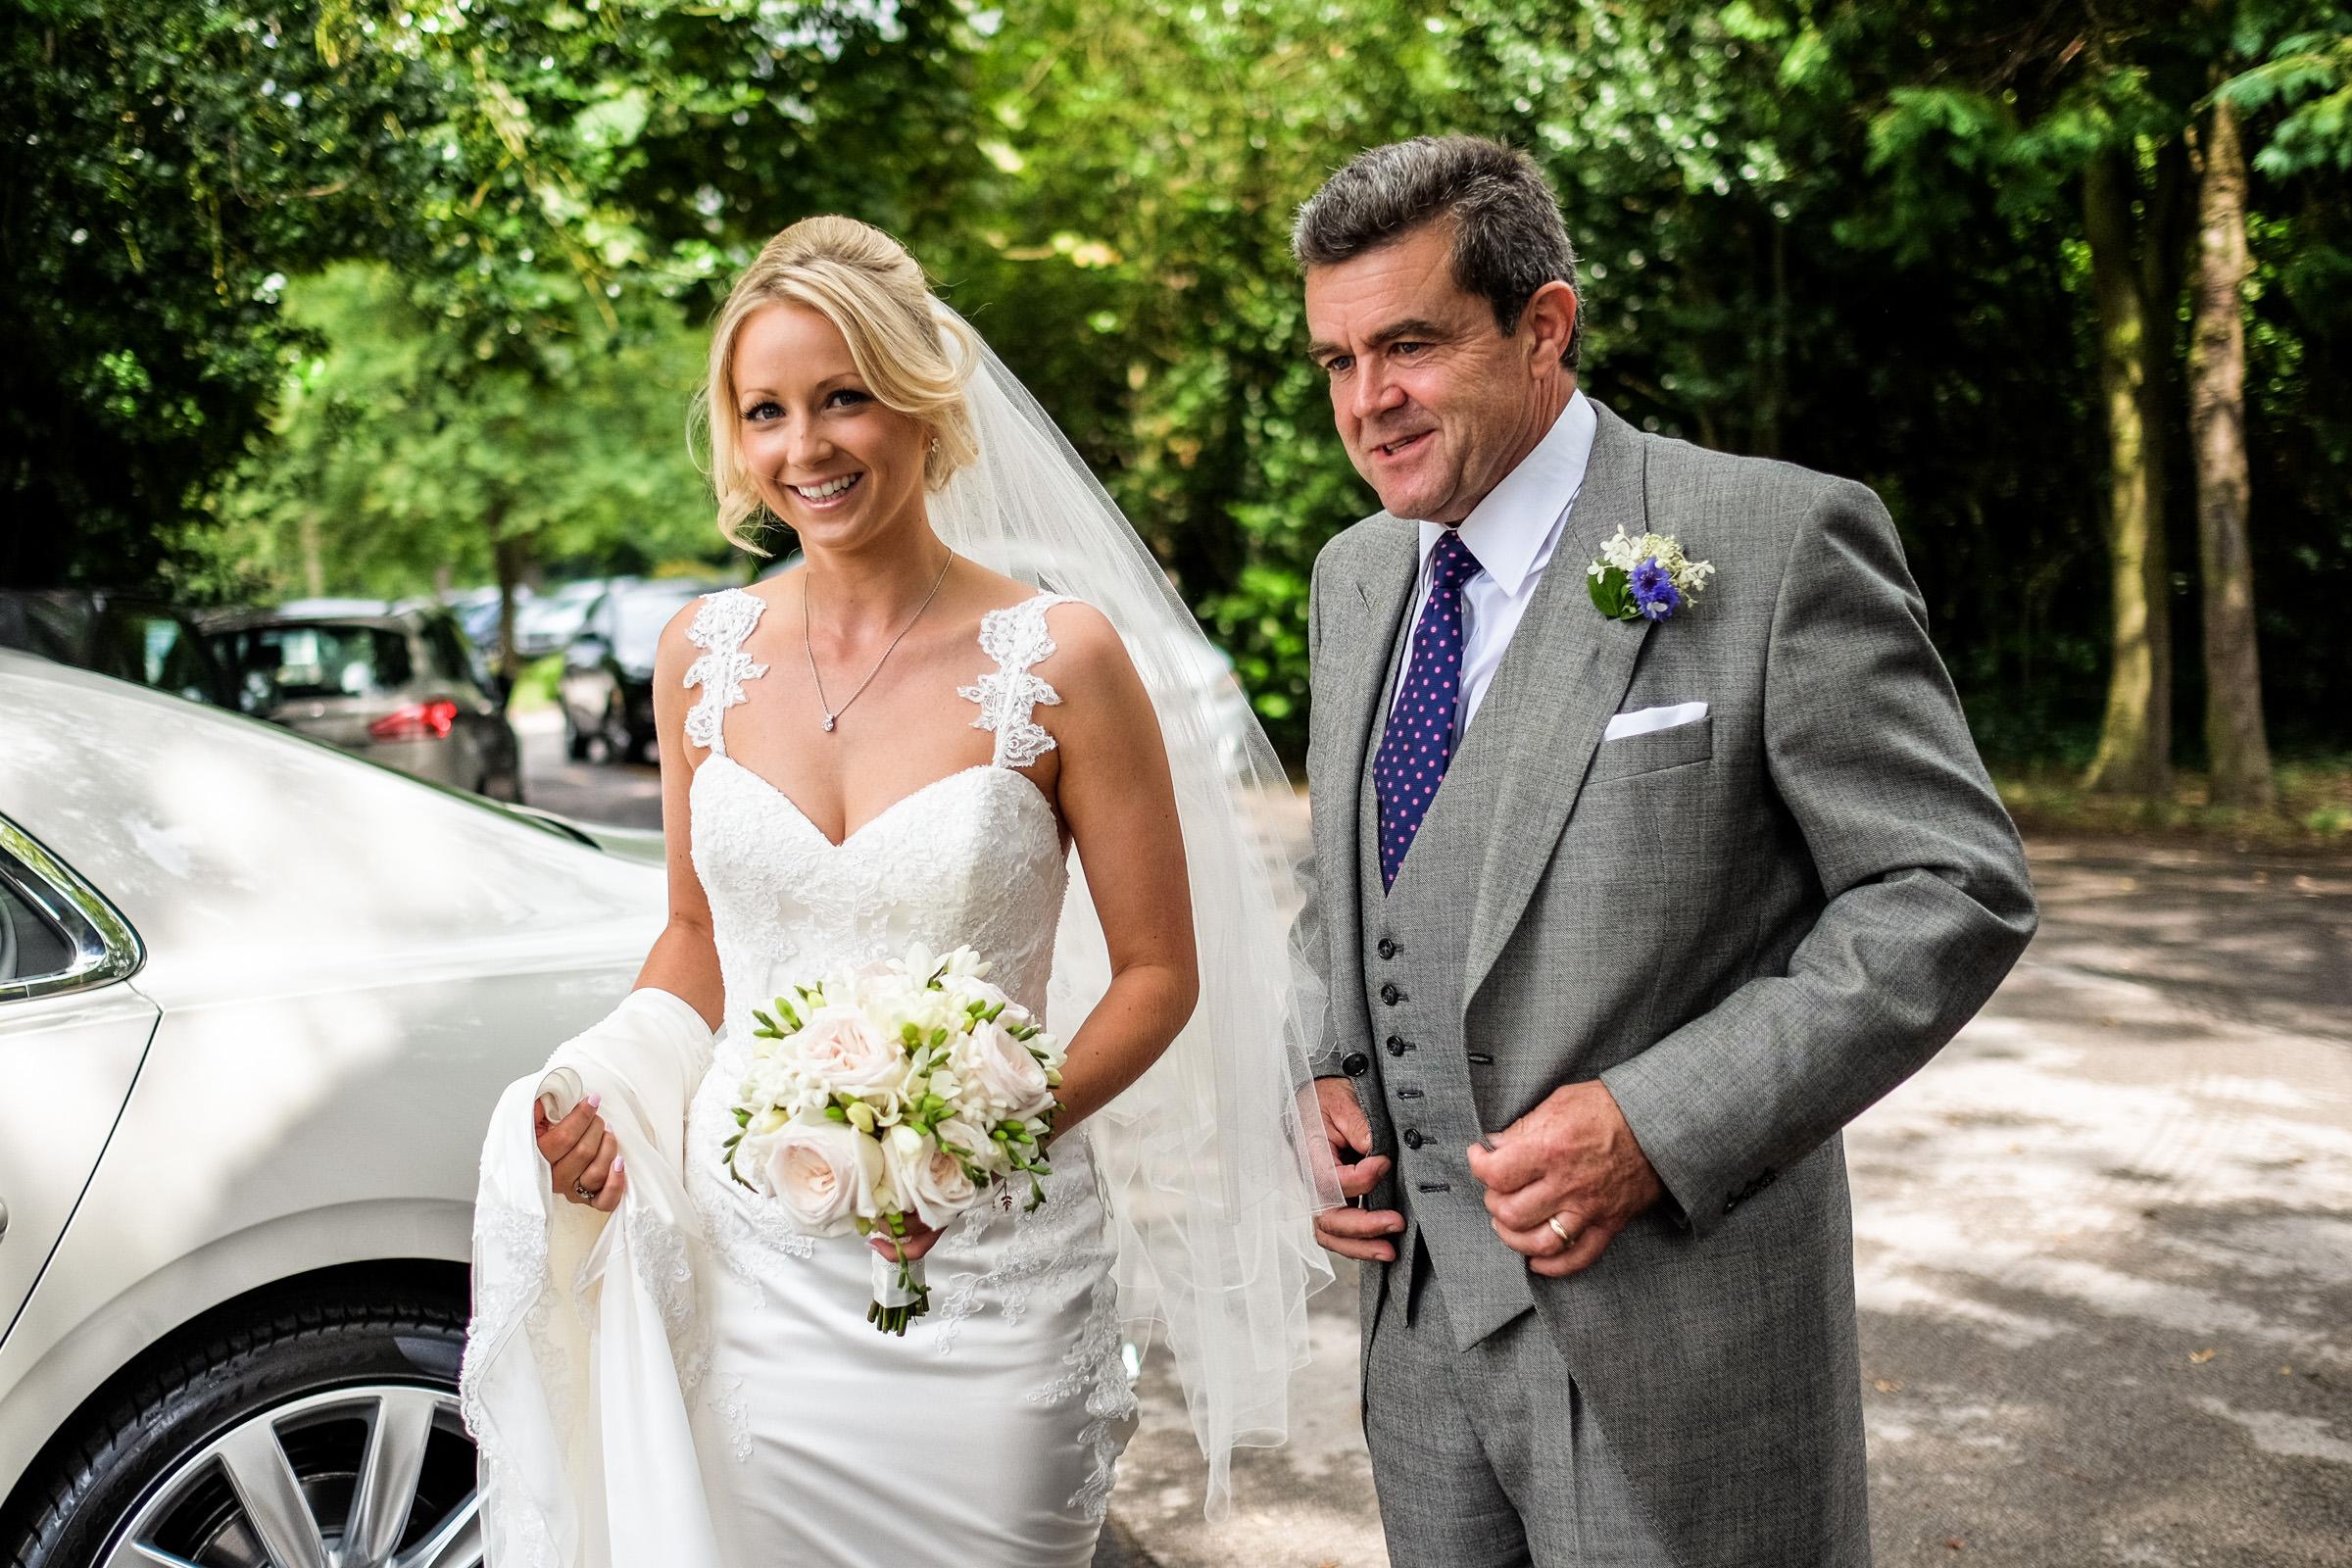 Wedding+at+Parkside+School+in+Surrey+013.jpg